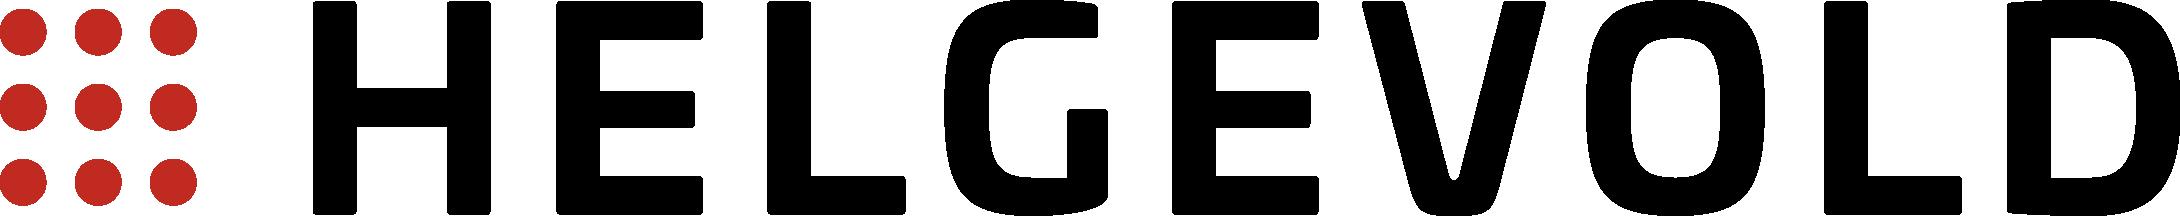 Helgevold logo